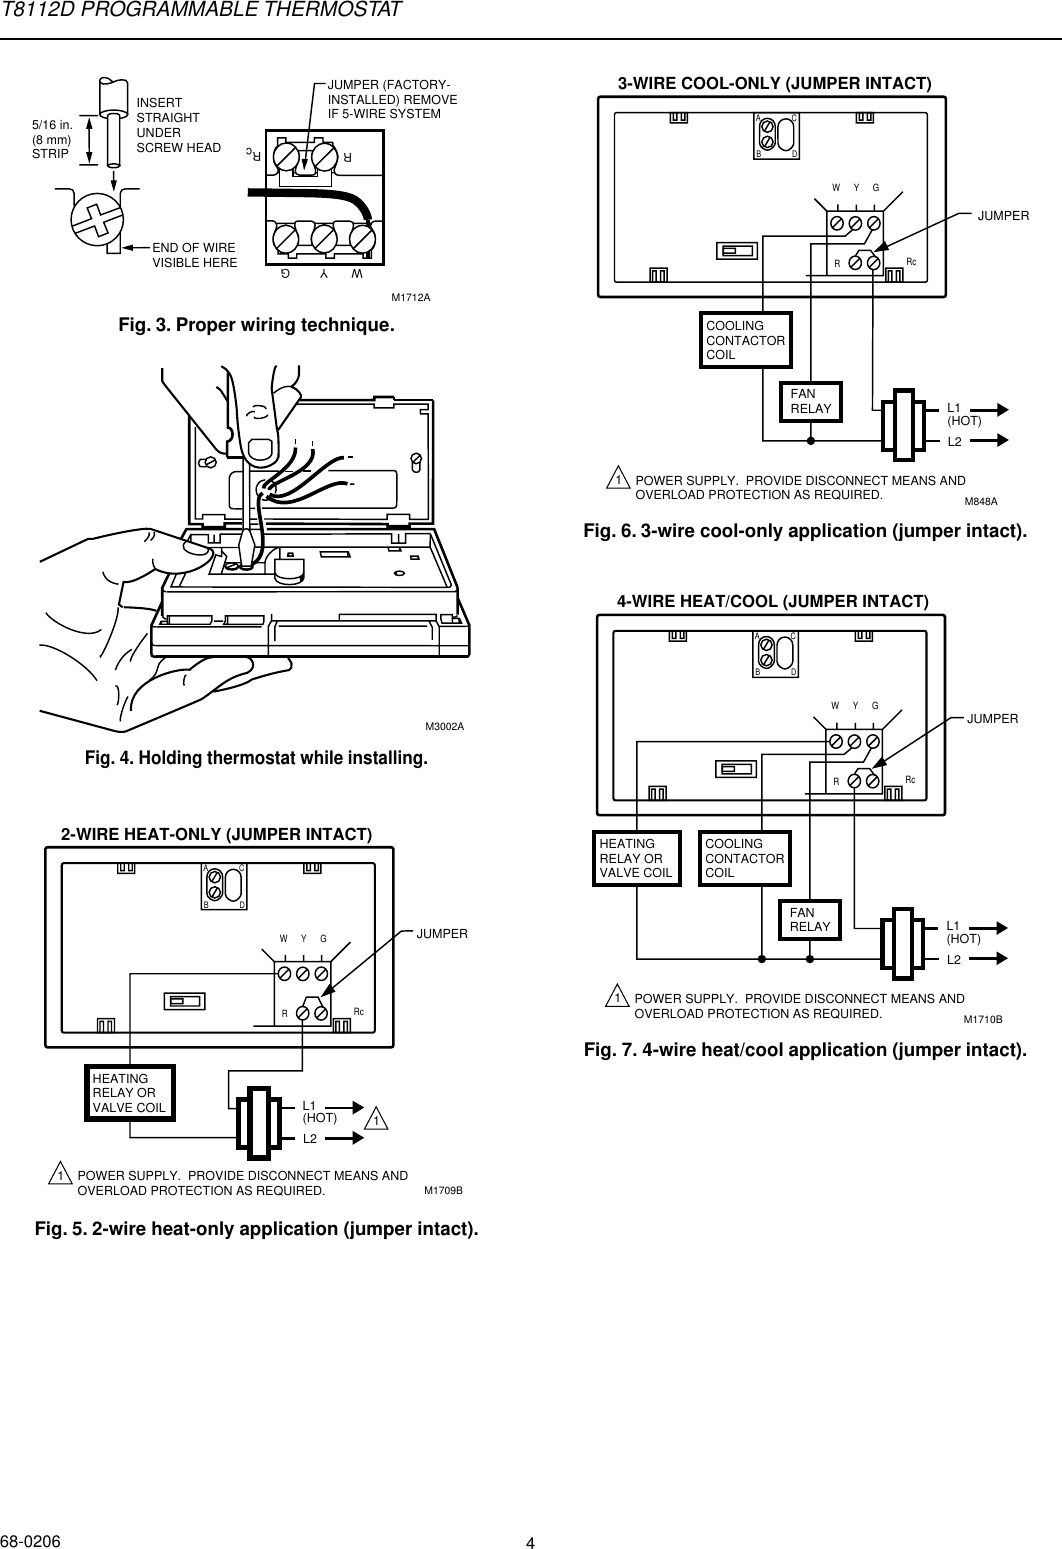 honeywell visionpro 8000 thermostat user manual